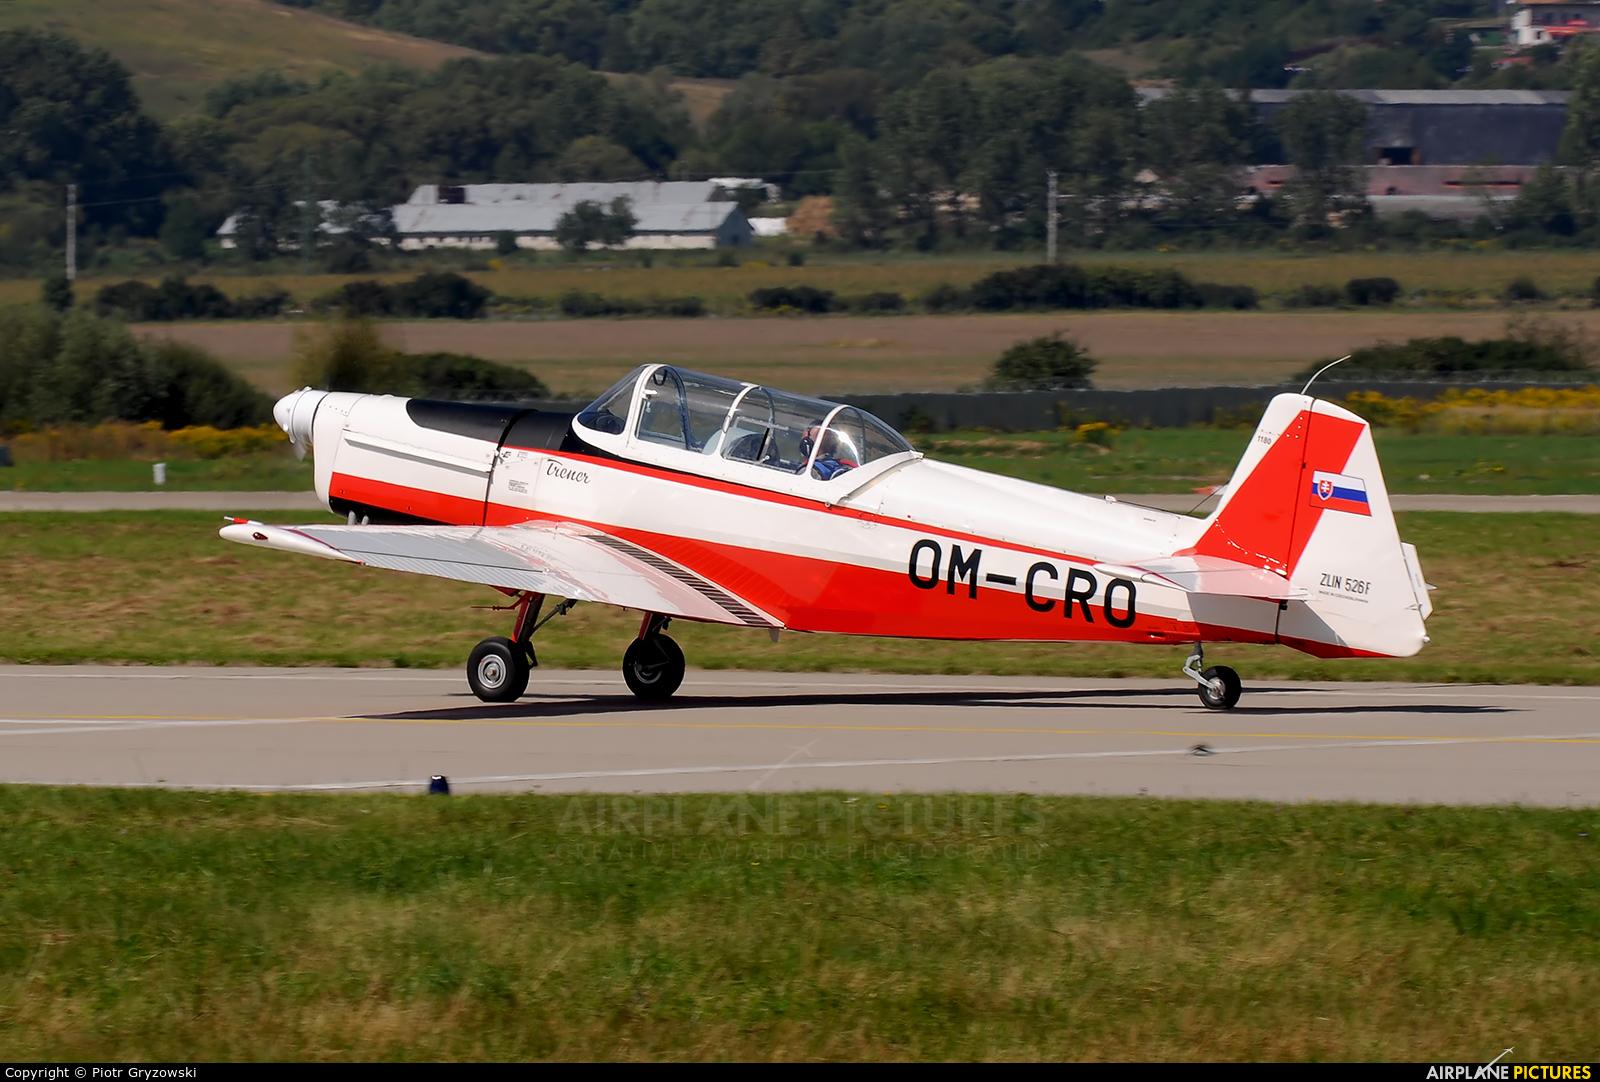 Slovensky Narodny Aeroklub OM-CRO aircraft at Sliač